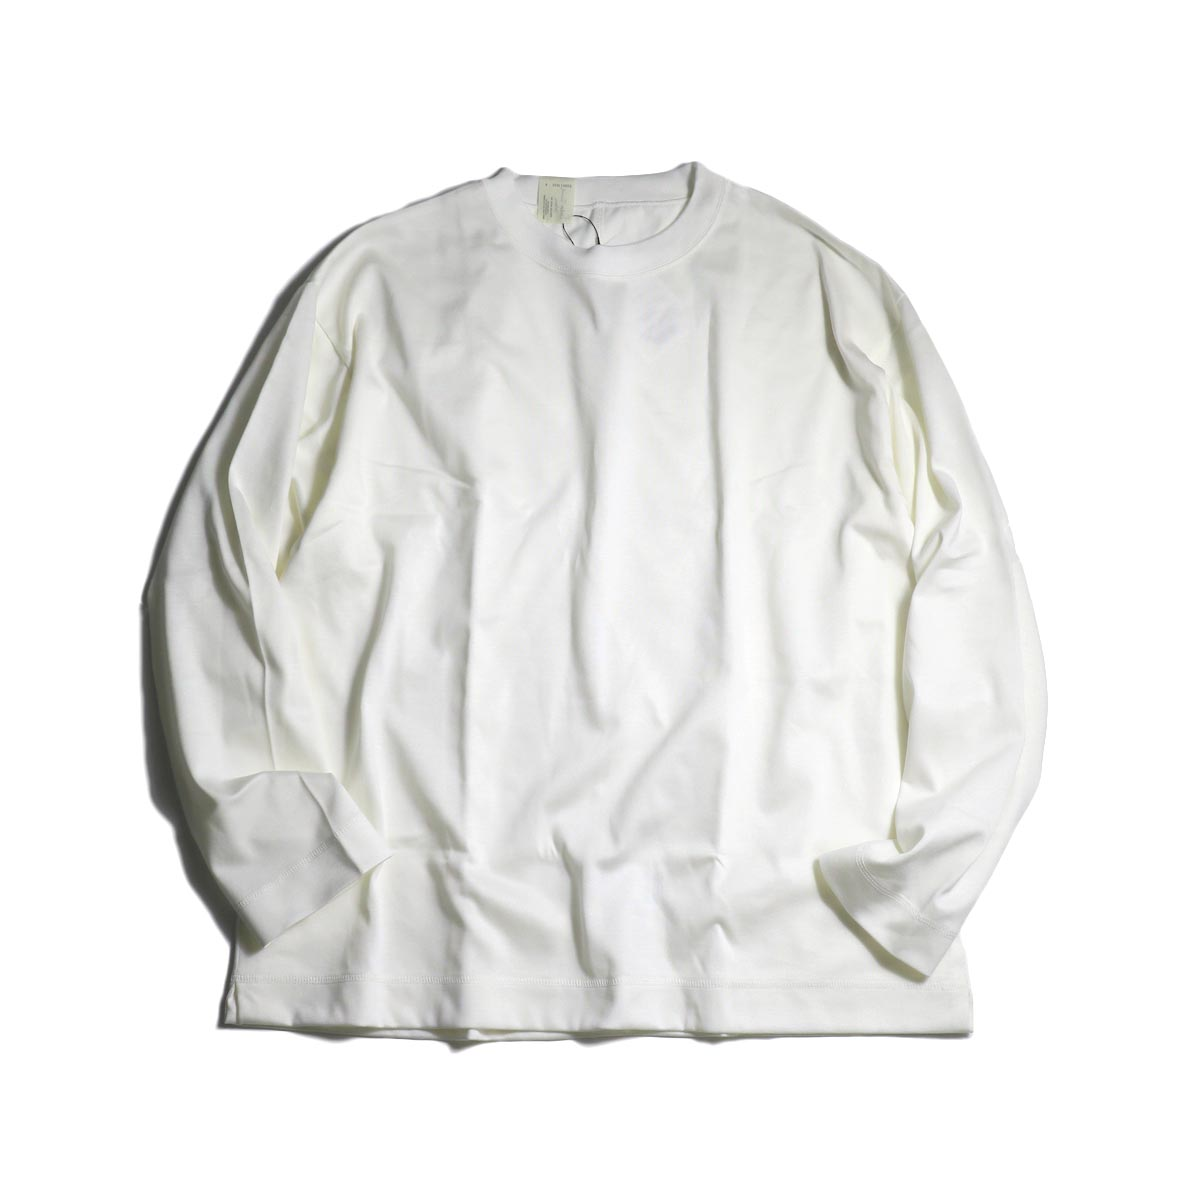 N.HOOLYWOOD / 20RCH-004 Crew Neck Long Sleeve (White)